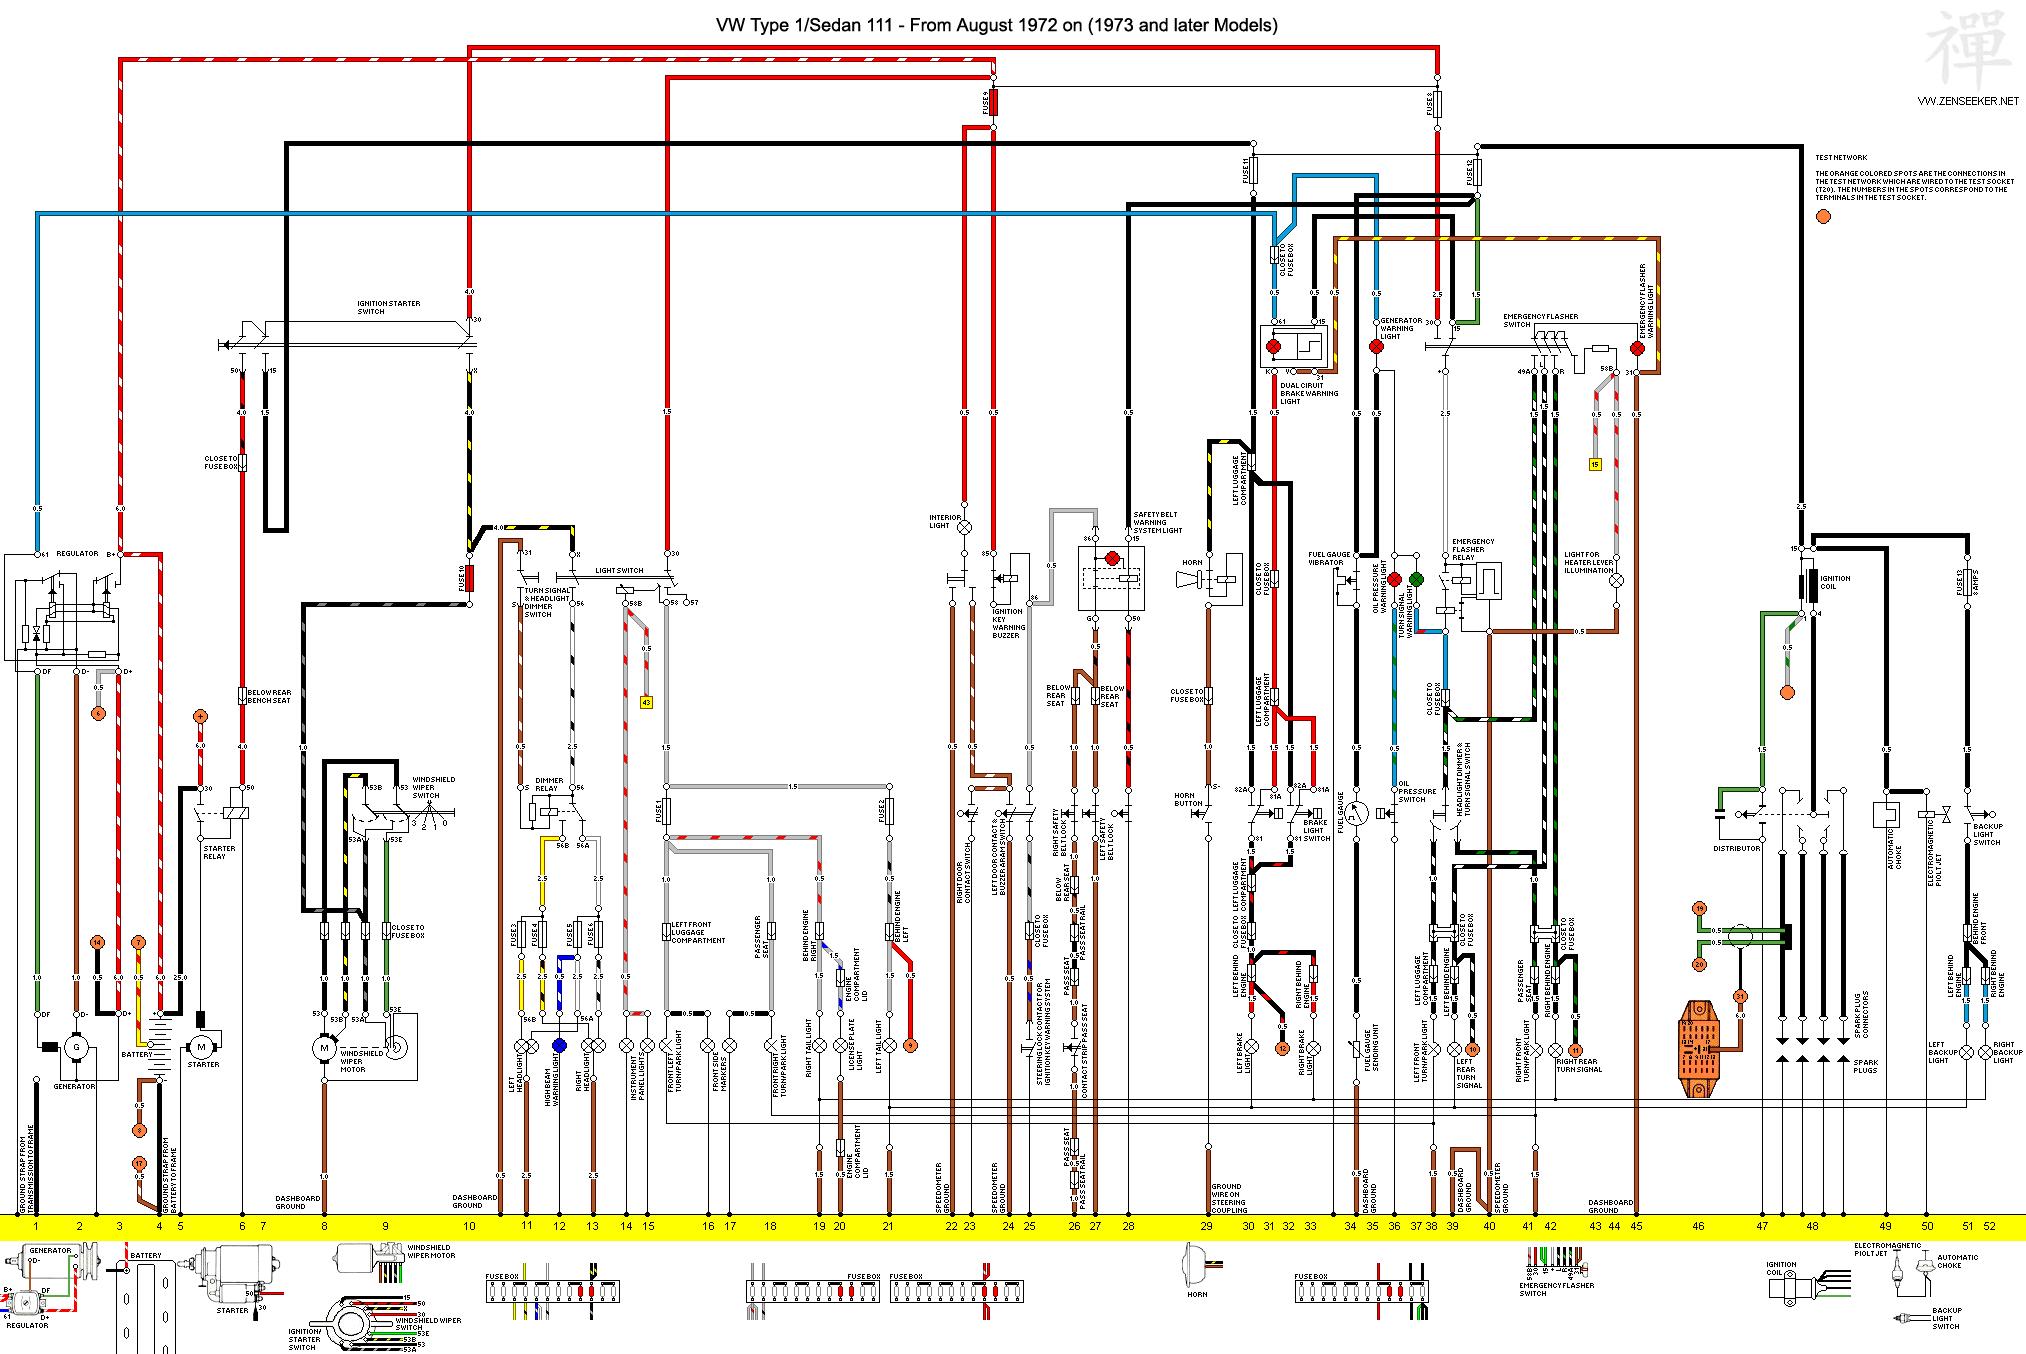 1973 vw thing steering column wiring diagram